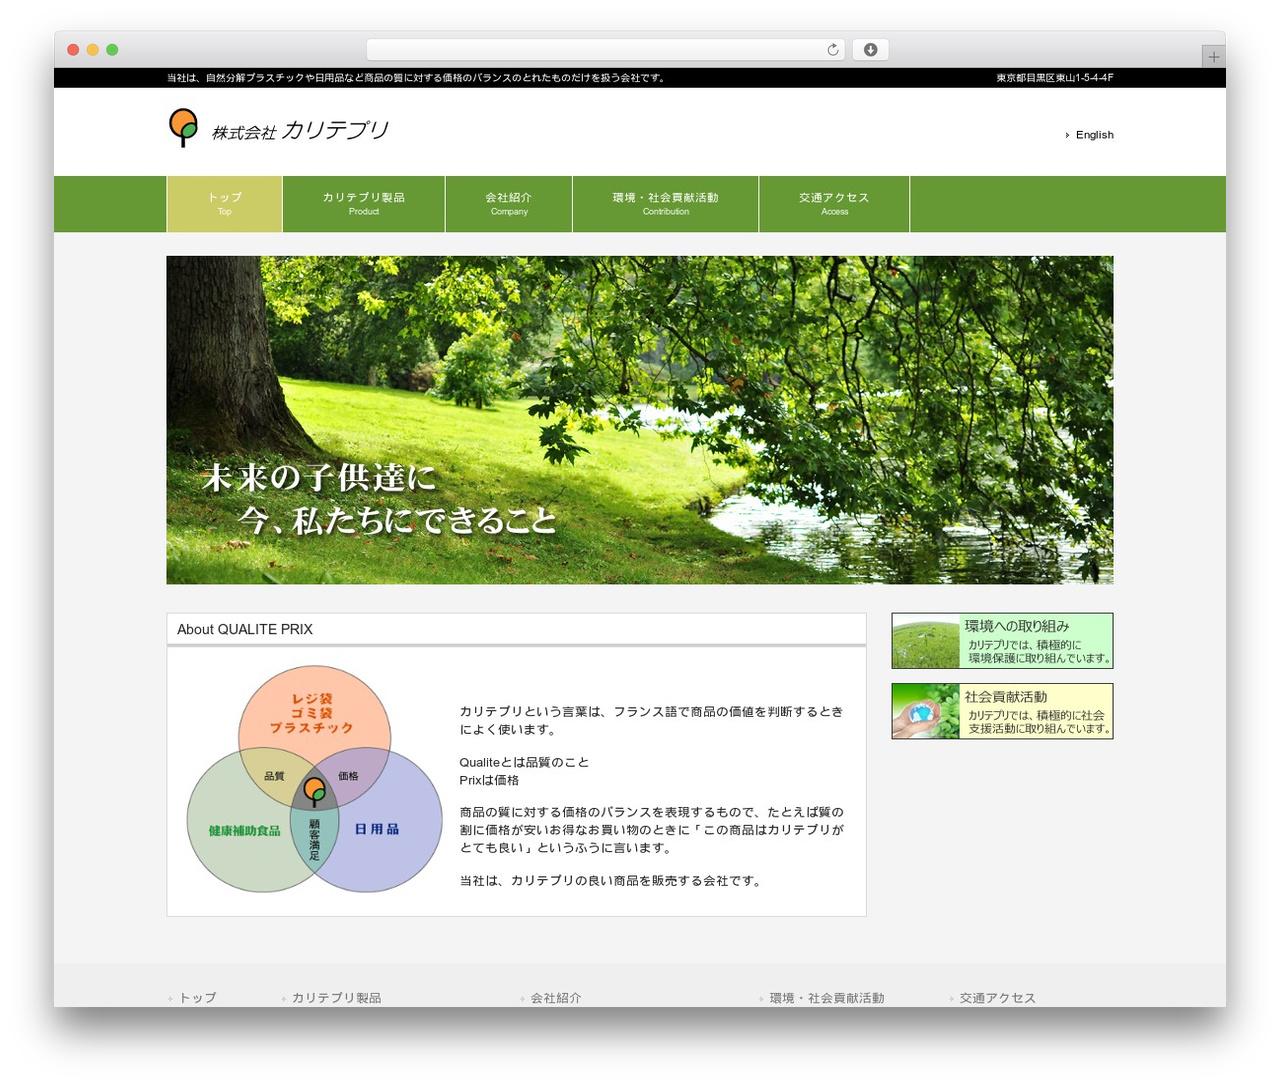 cloudtpl_925 best WordPress template - qpi.jp